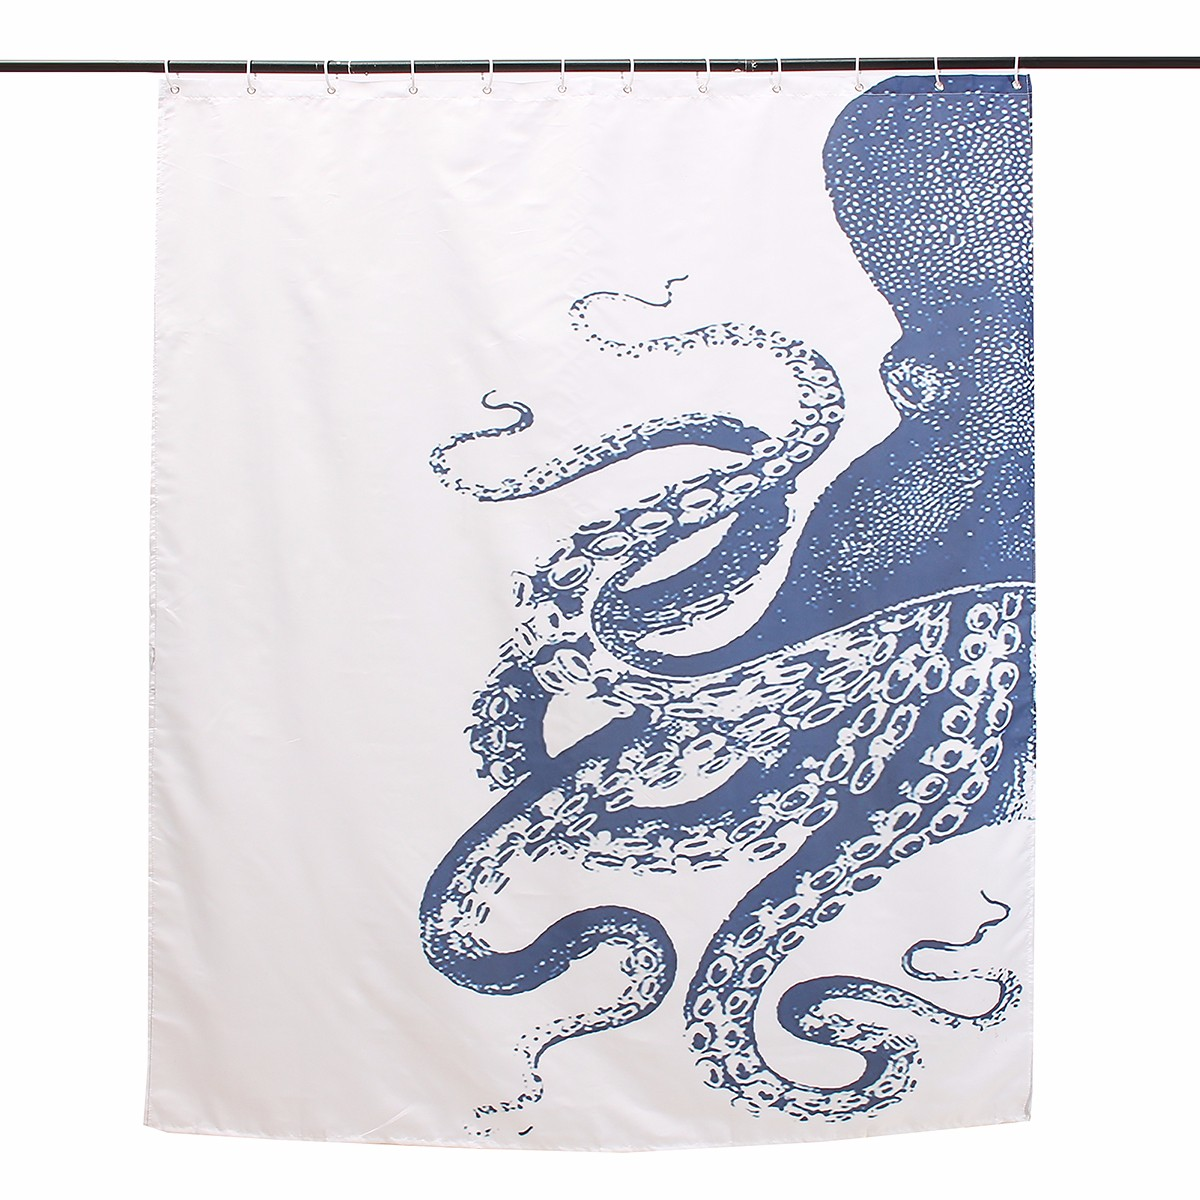 150x180cm Waterproof Halloween Octopus Polyester Shower Curtain Bathroom Decor with 12 Hooks